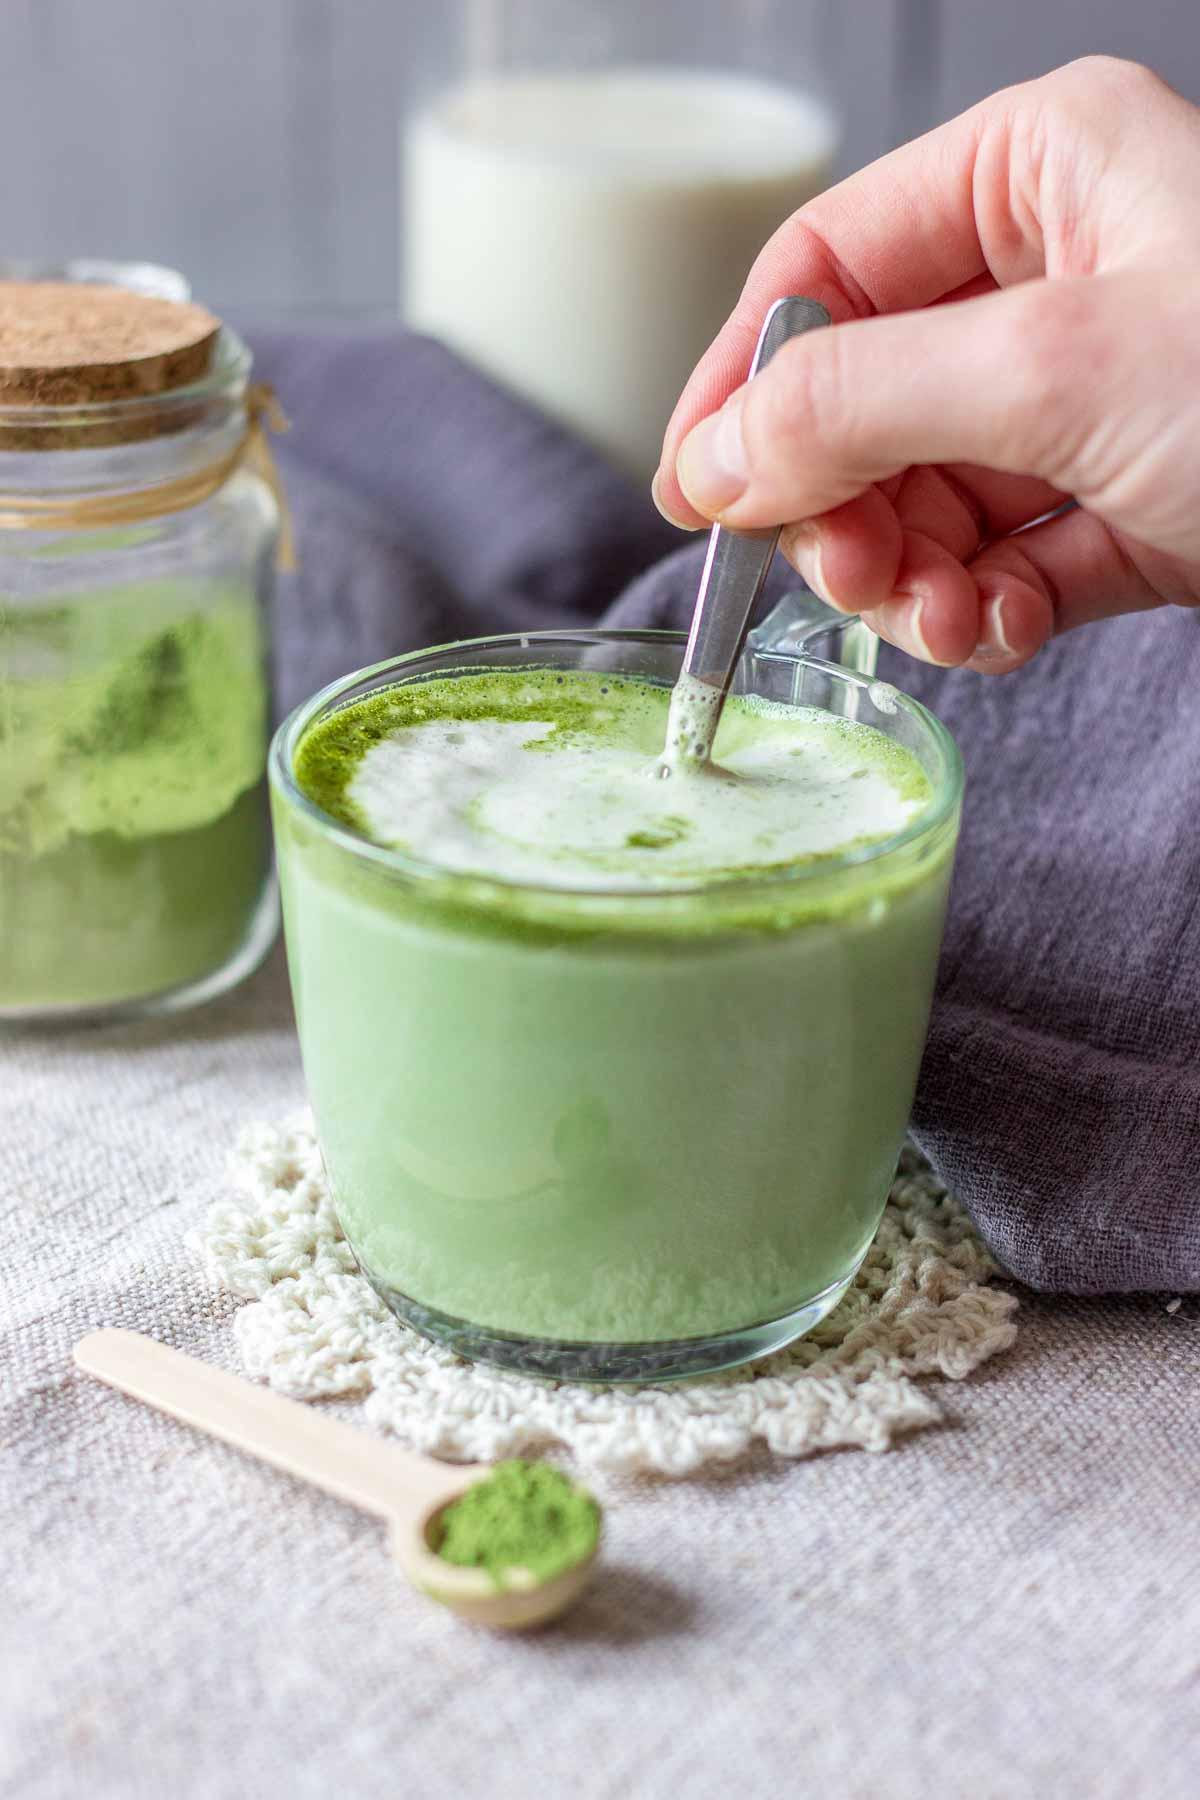 Hand mixing a matcha green tea latte served in a mug